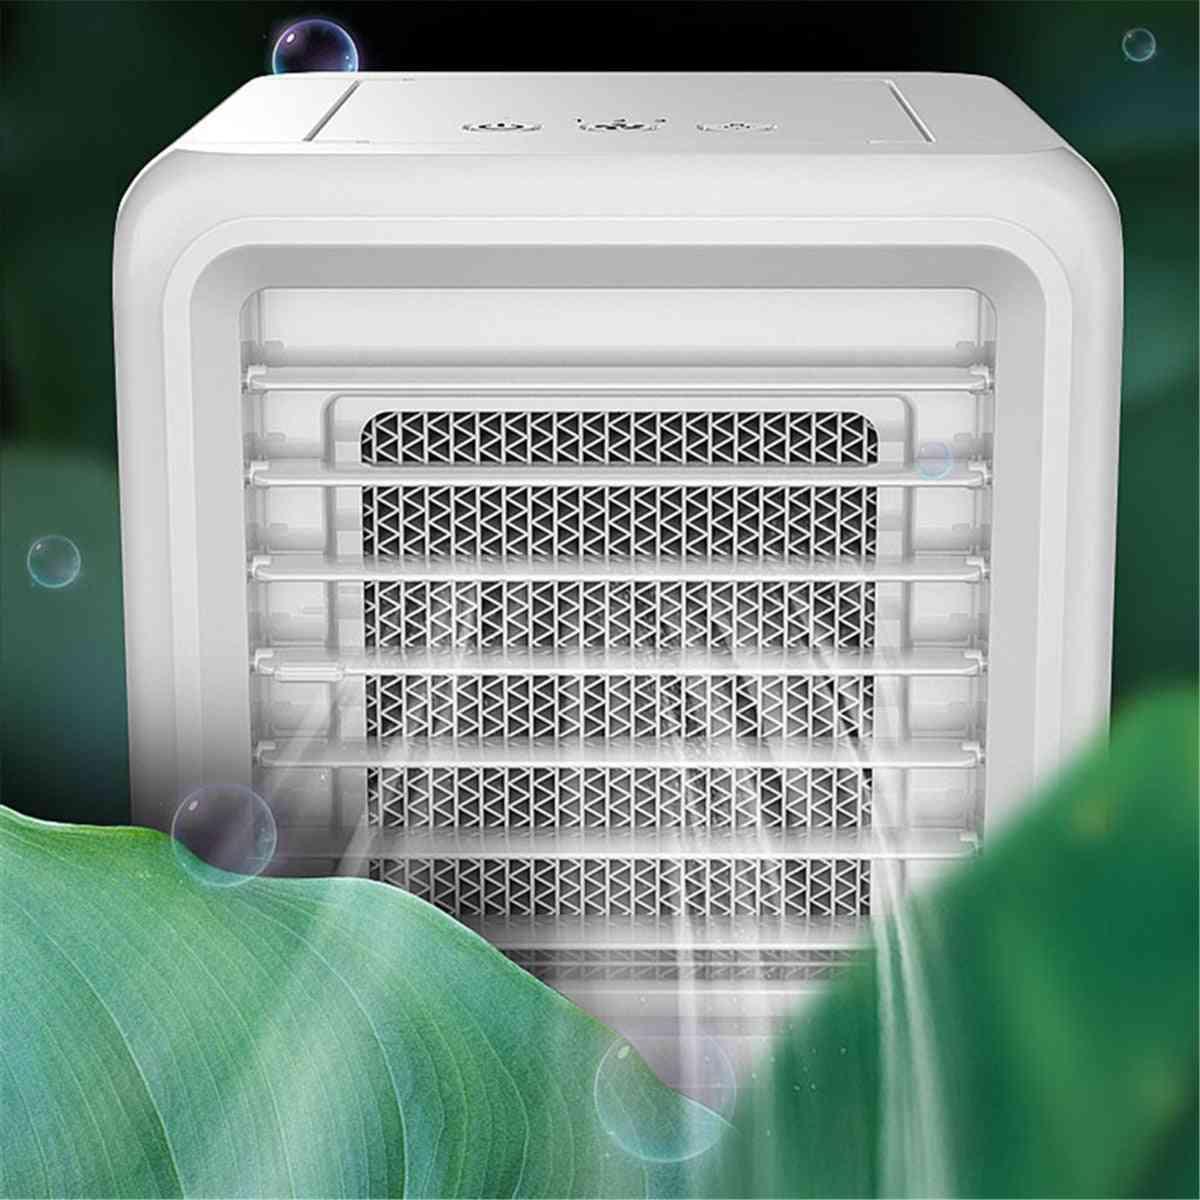 Mini Air Conditioning Humidifier, Purifier, Led, Usb Desktop Cooler